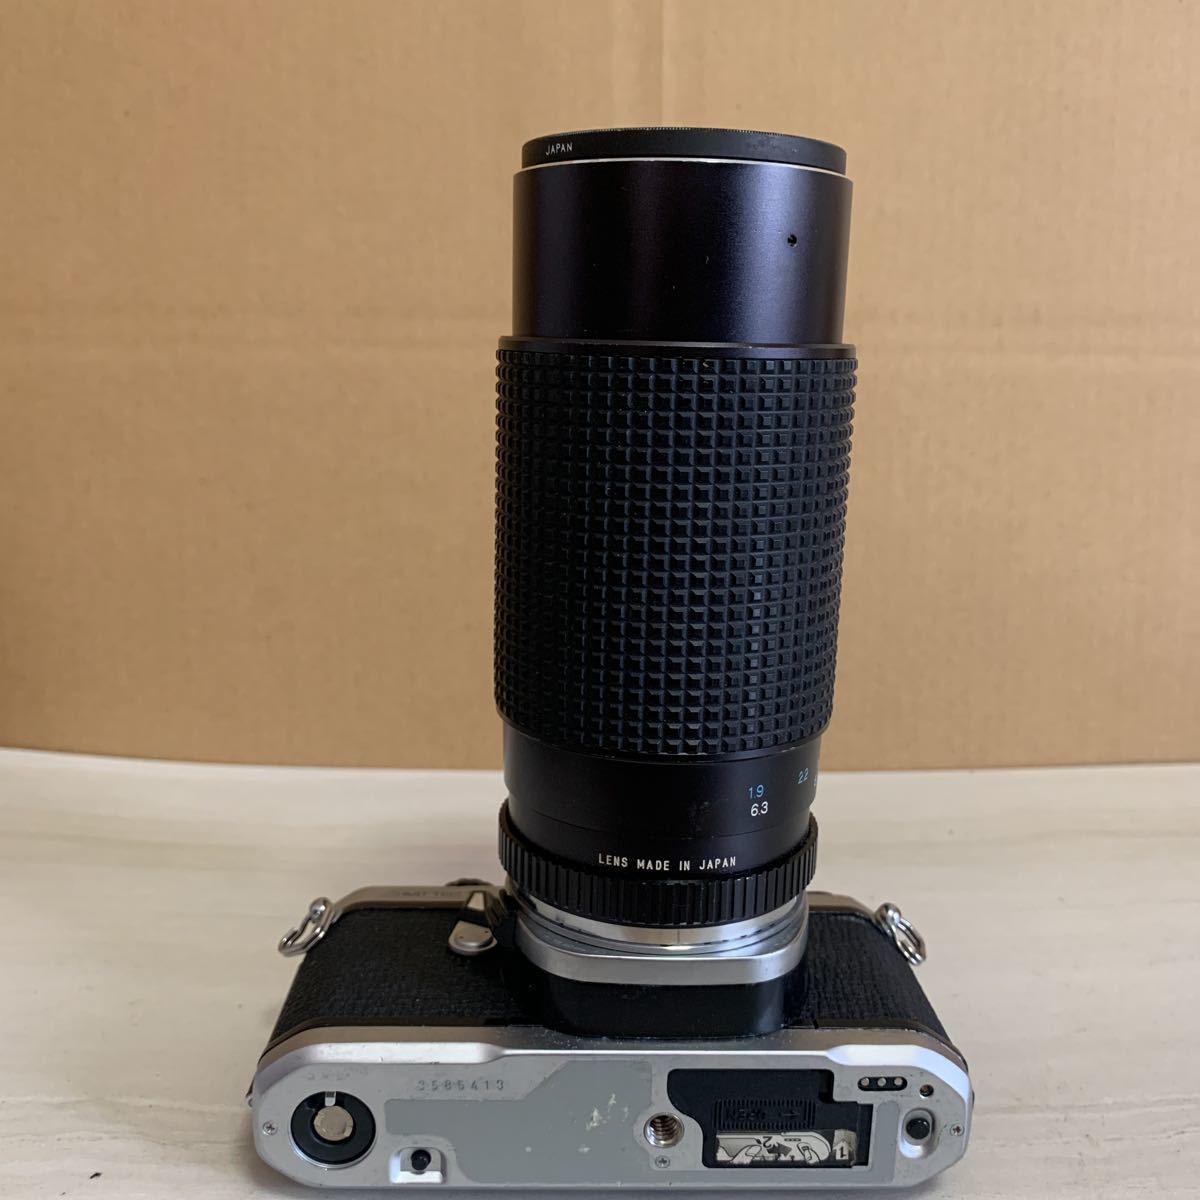 PENTAX ME F ペンタックス 一眼レフカメラ フィルムカメラ 未確認 2025_画像7